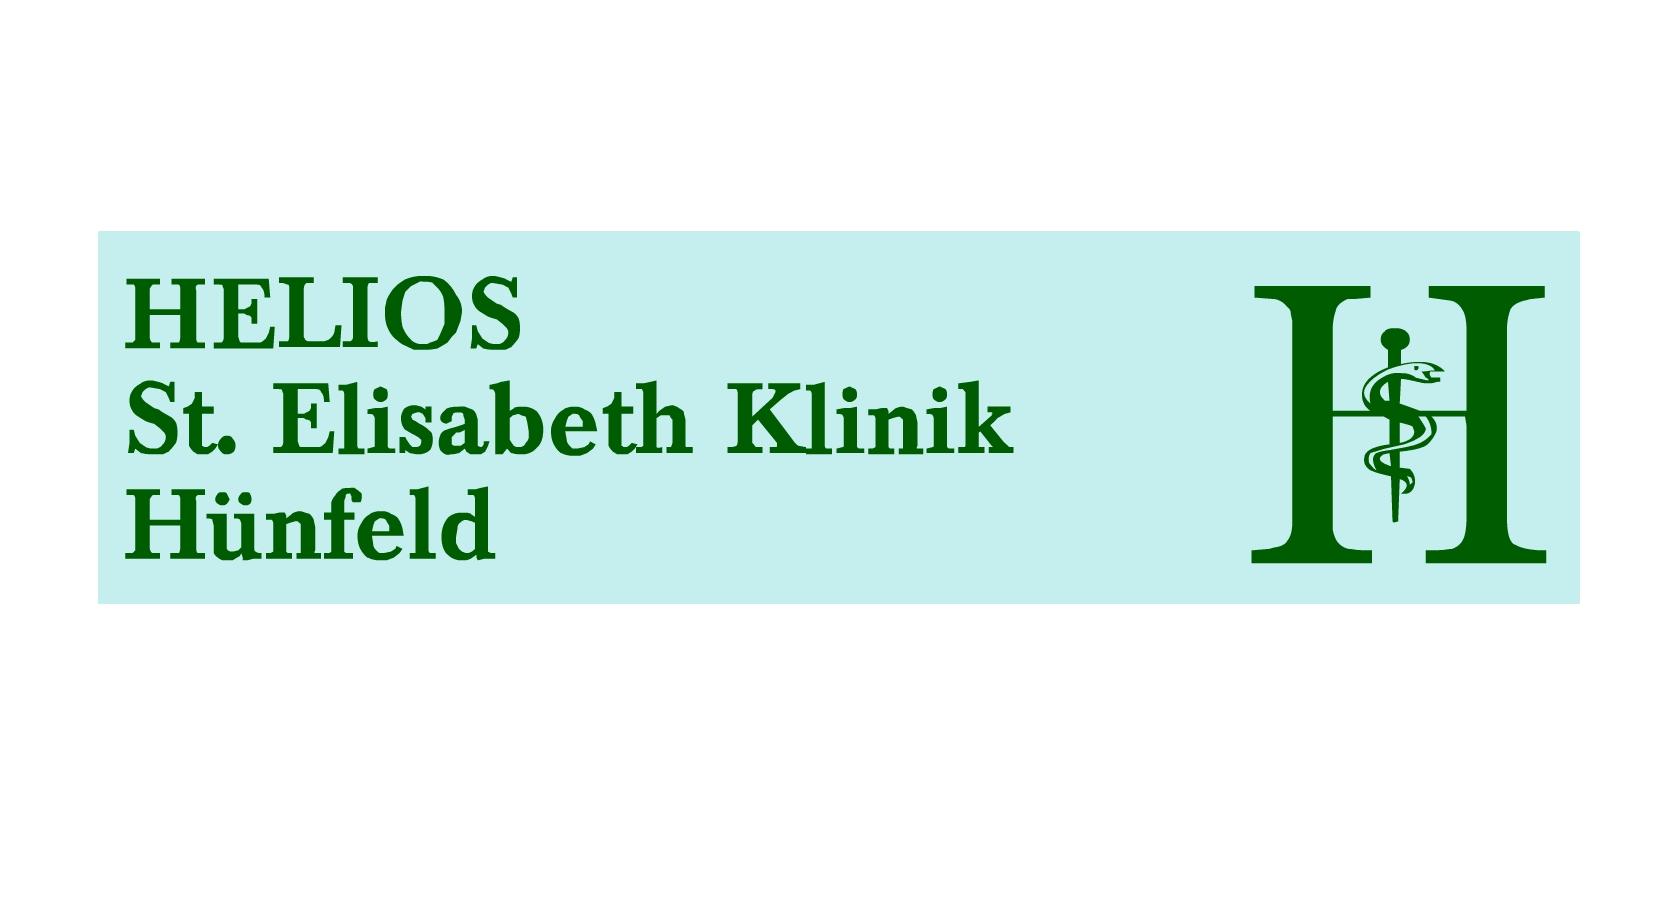 HELIOS St.Elisabeth Klinik